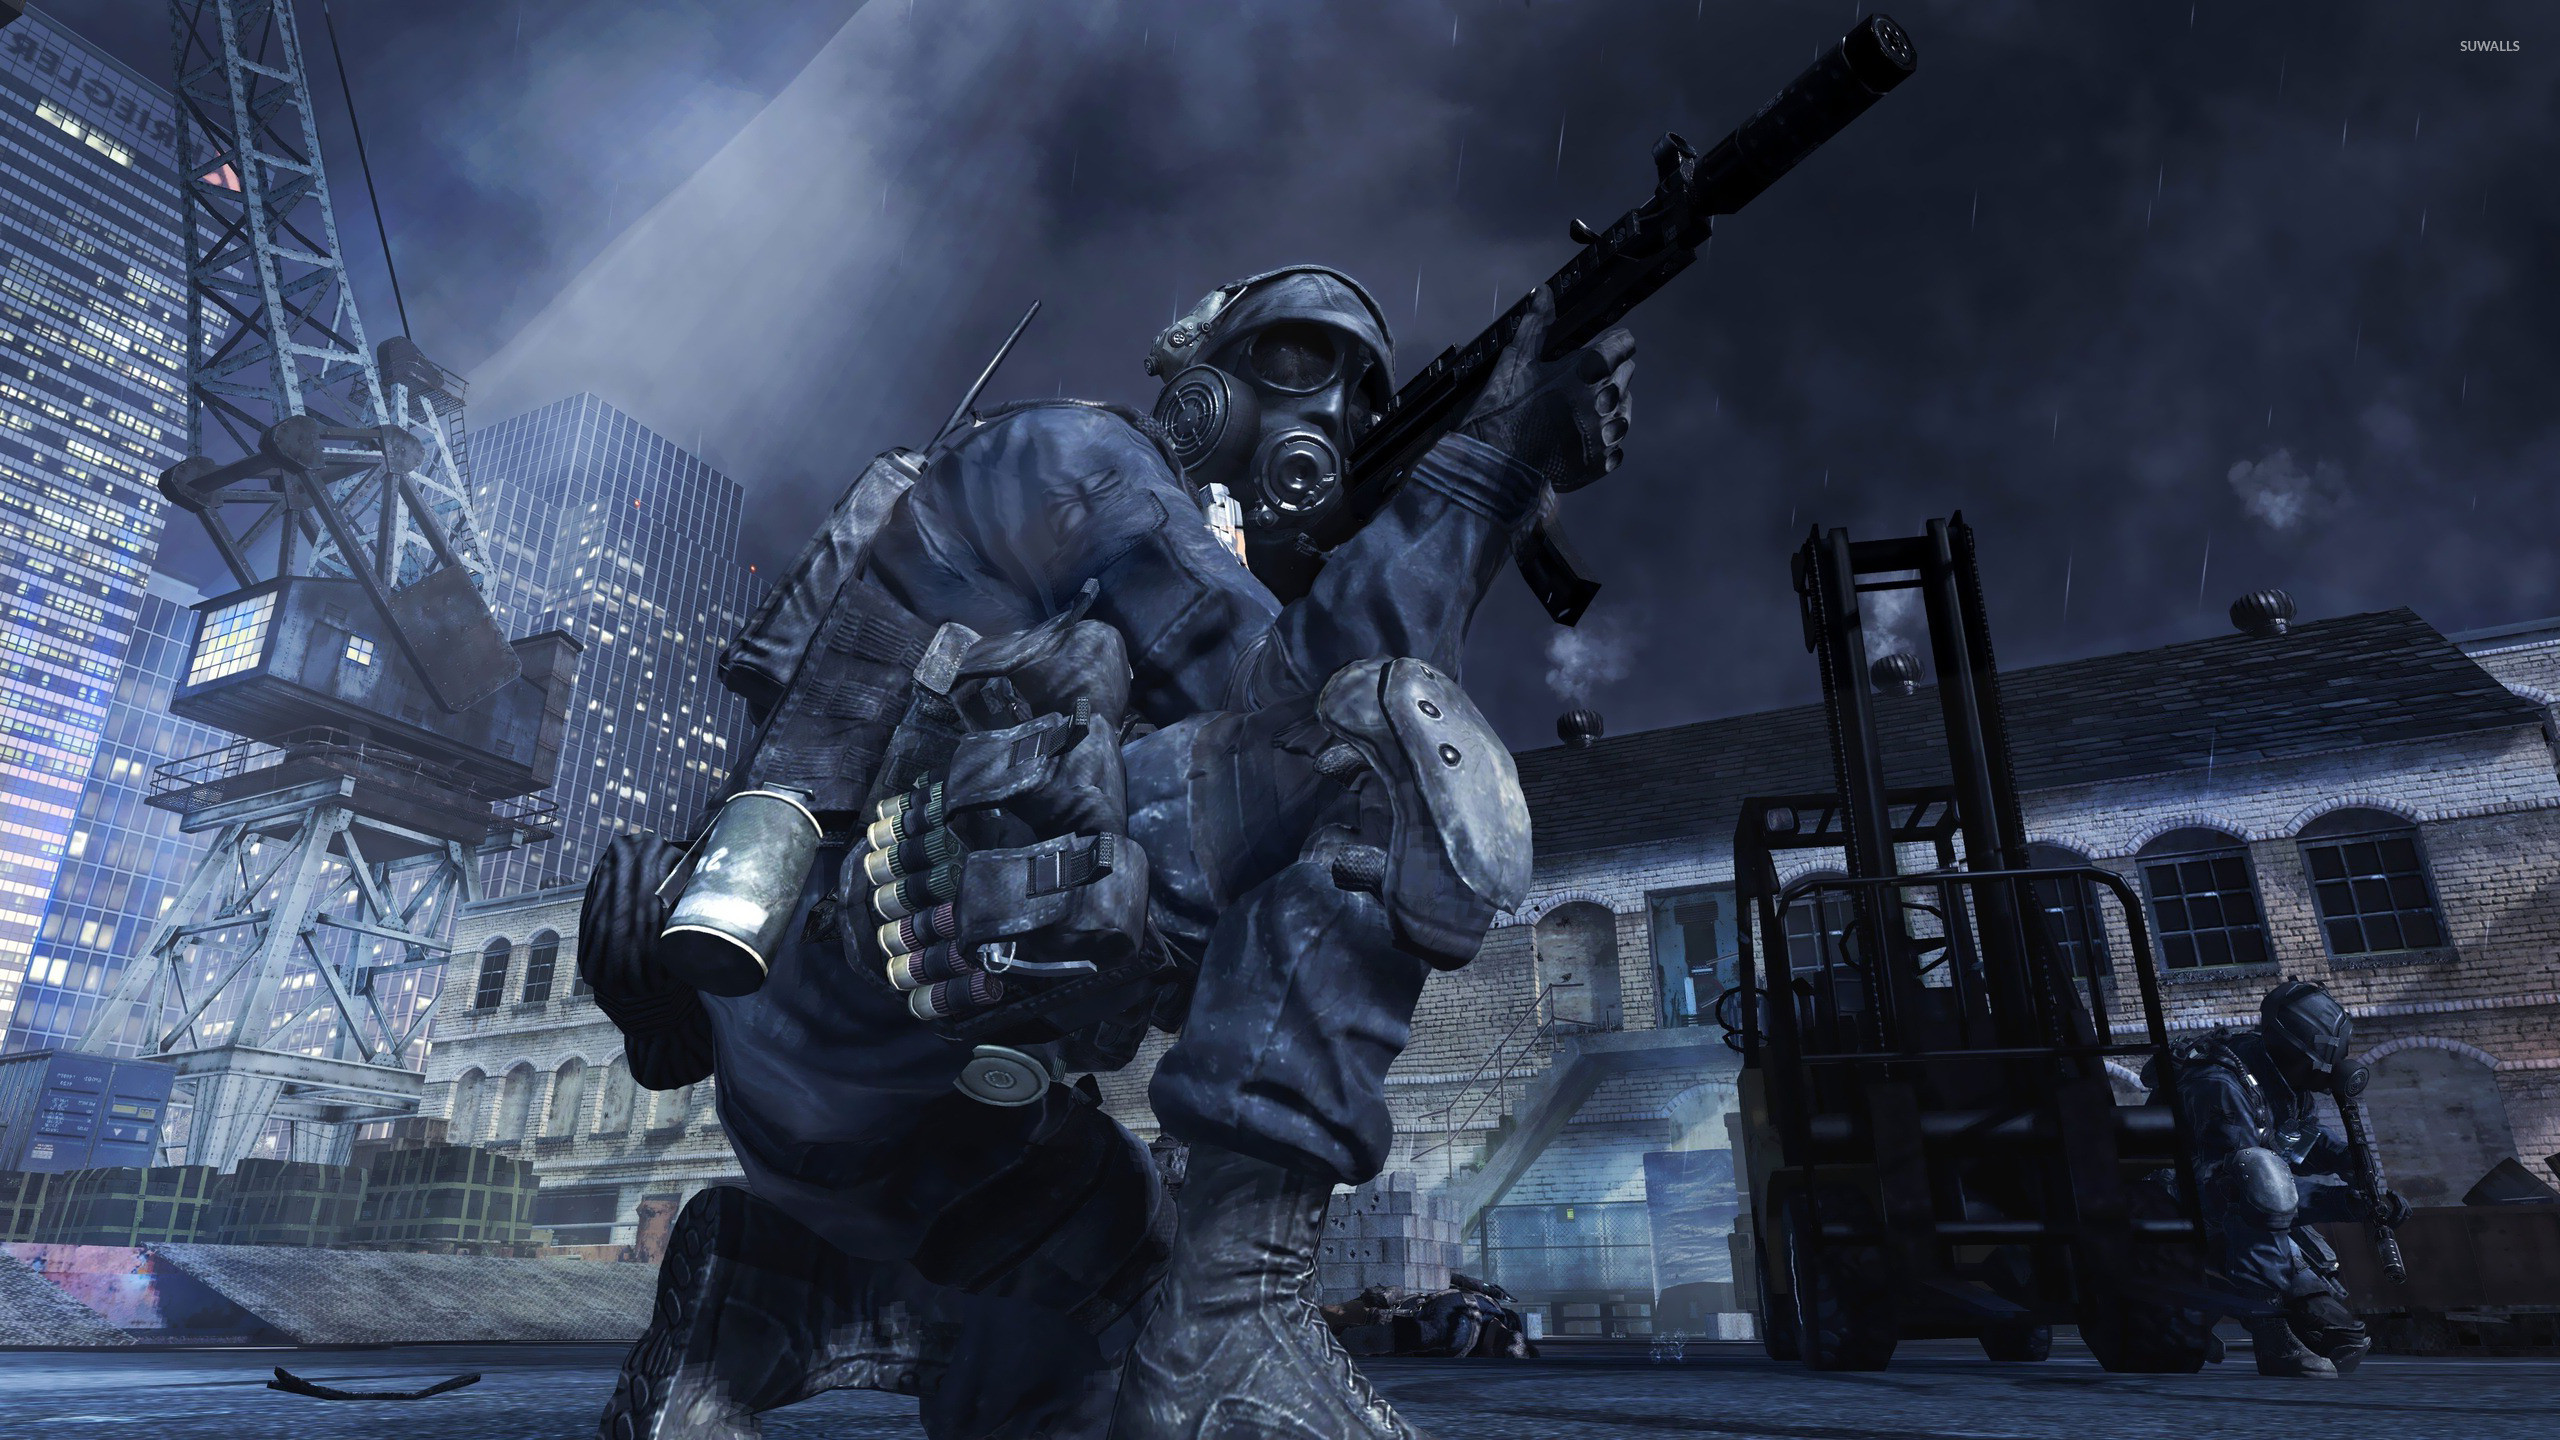 Call of Duty: Modern Warfare 3 [13] wallpaper – Game wallpapers .